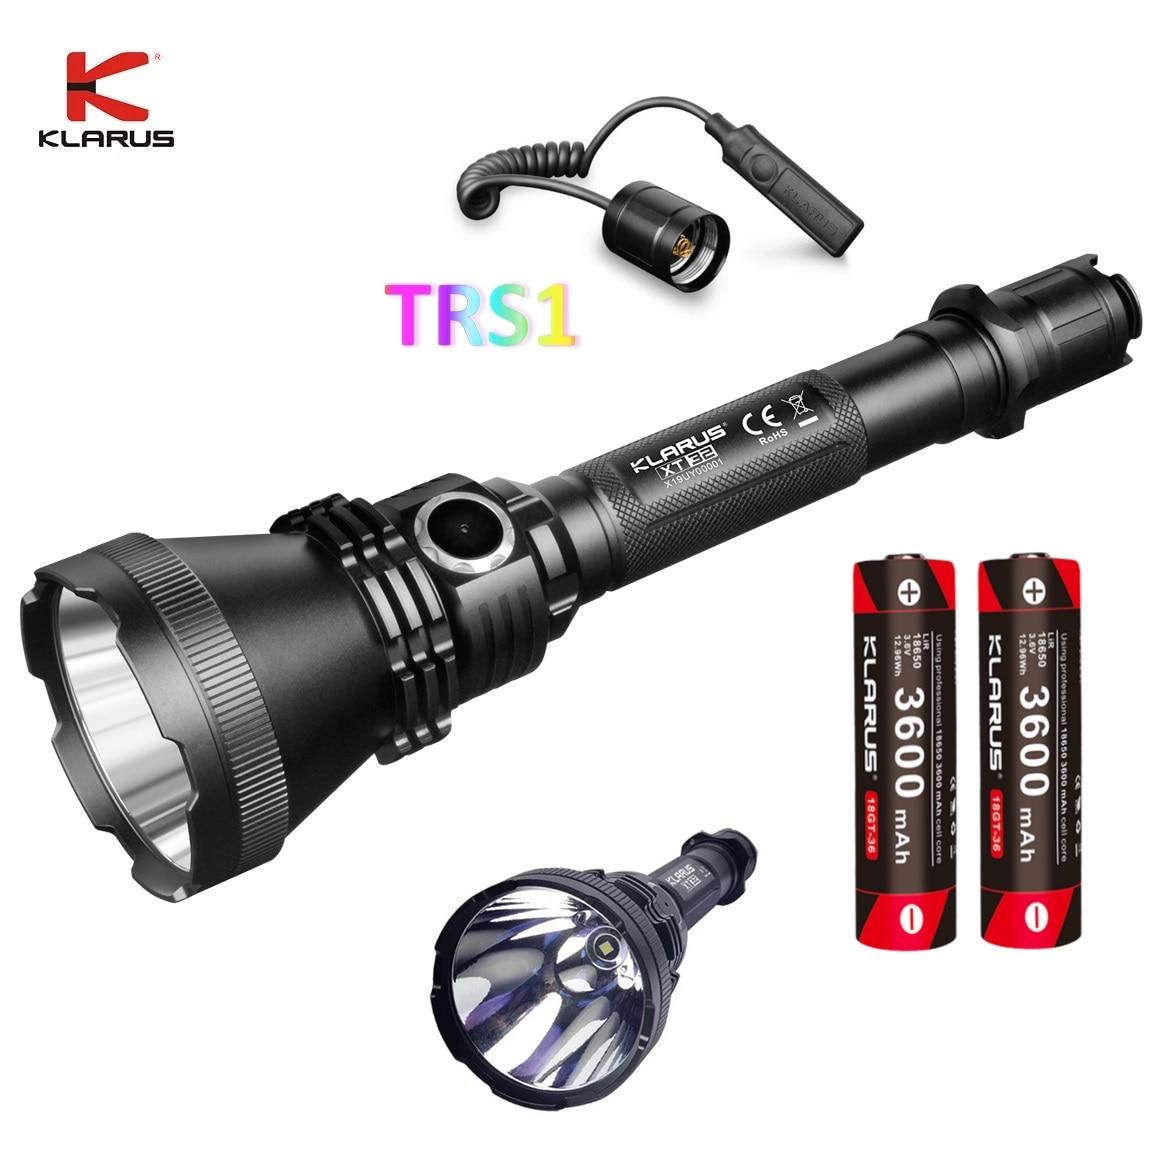 klarus xt32 lanterna led cree xp l oi v3 1200lm 1000m luz da tocha por 18650 bateria